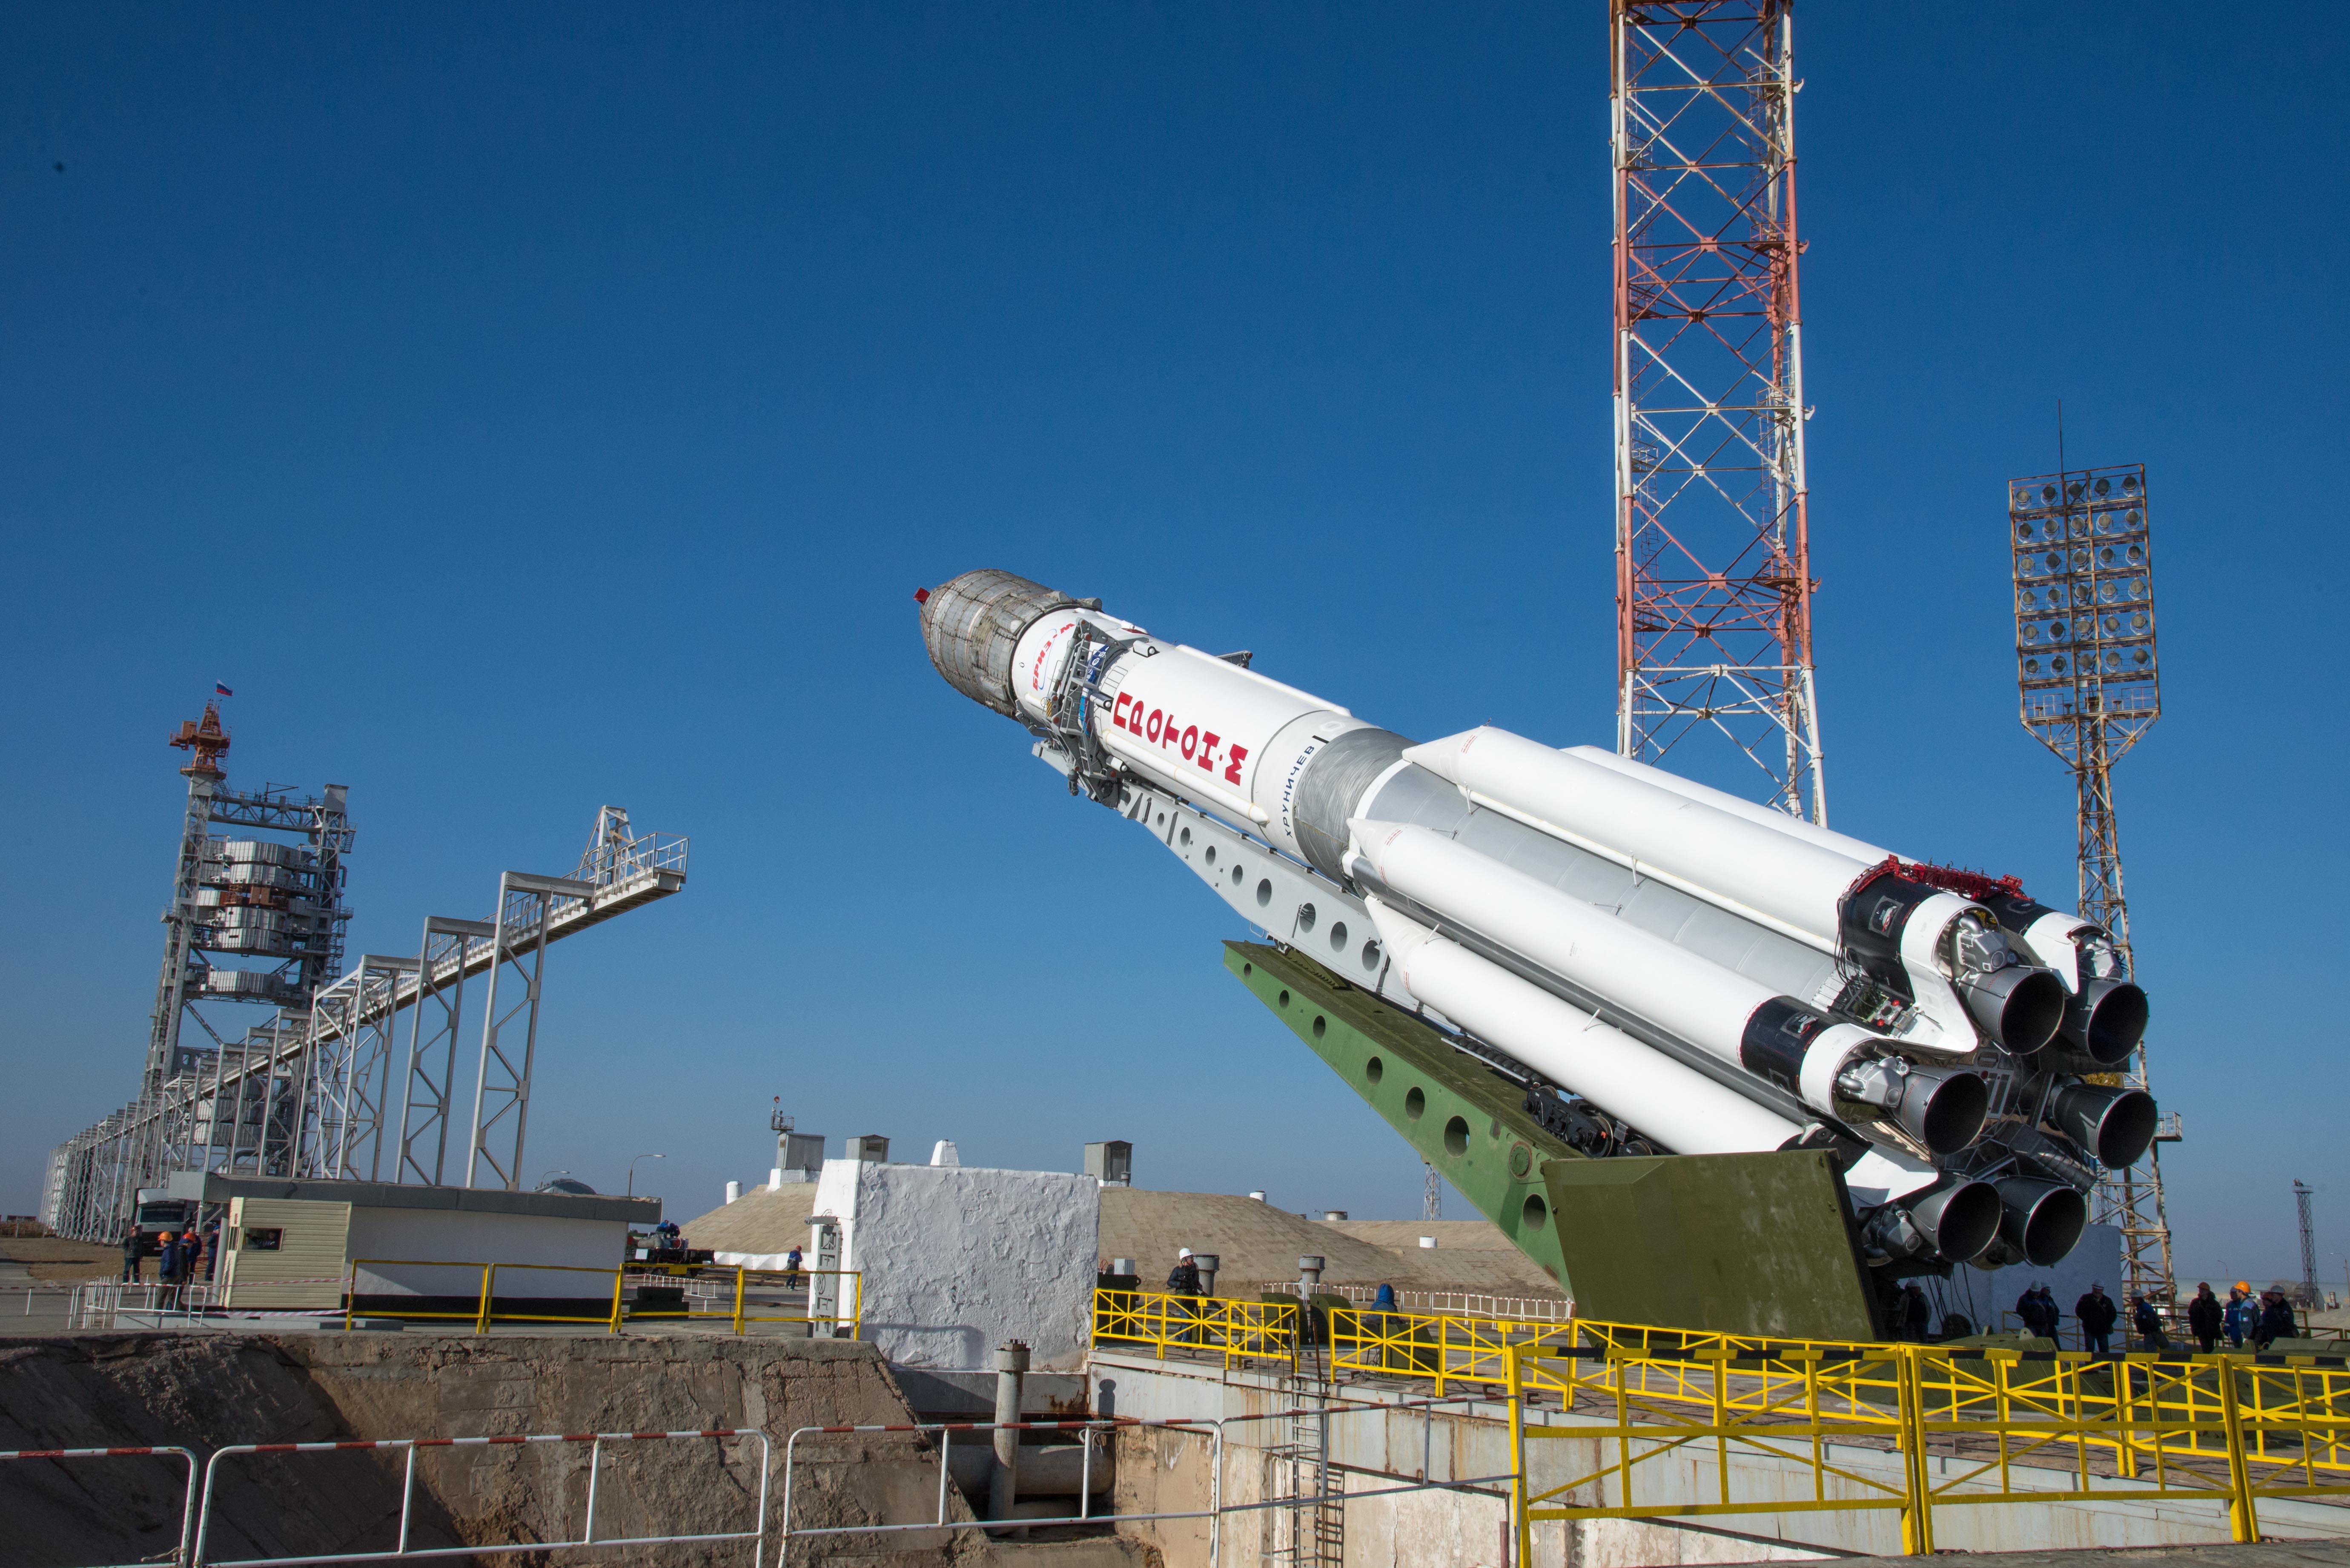 1567215226073-ExoMars2016_proton_launch_pad_160311-LC-AIT-15px.jpg